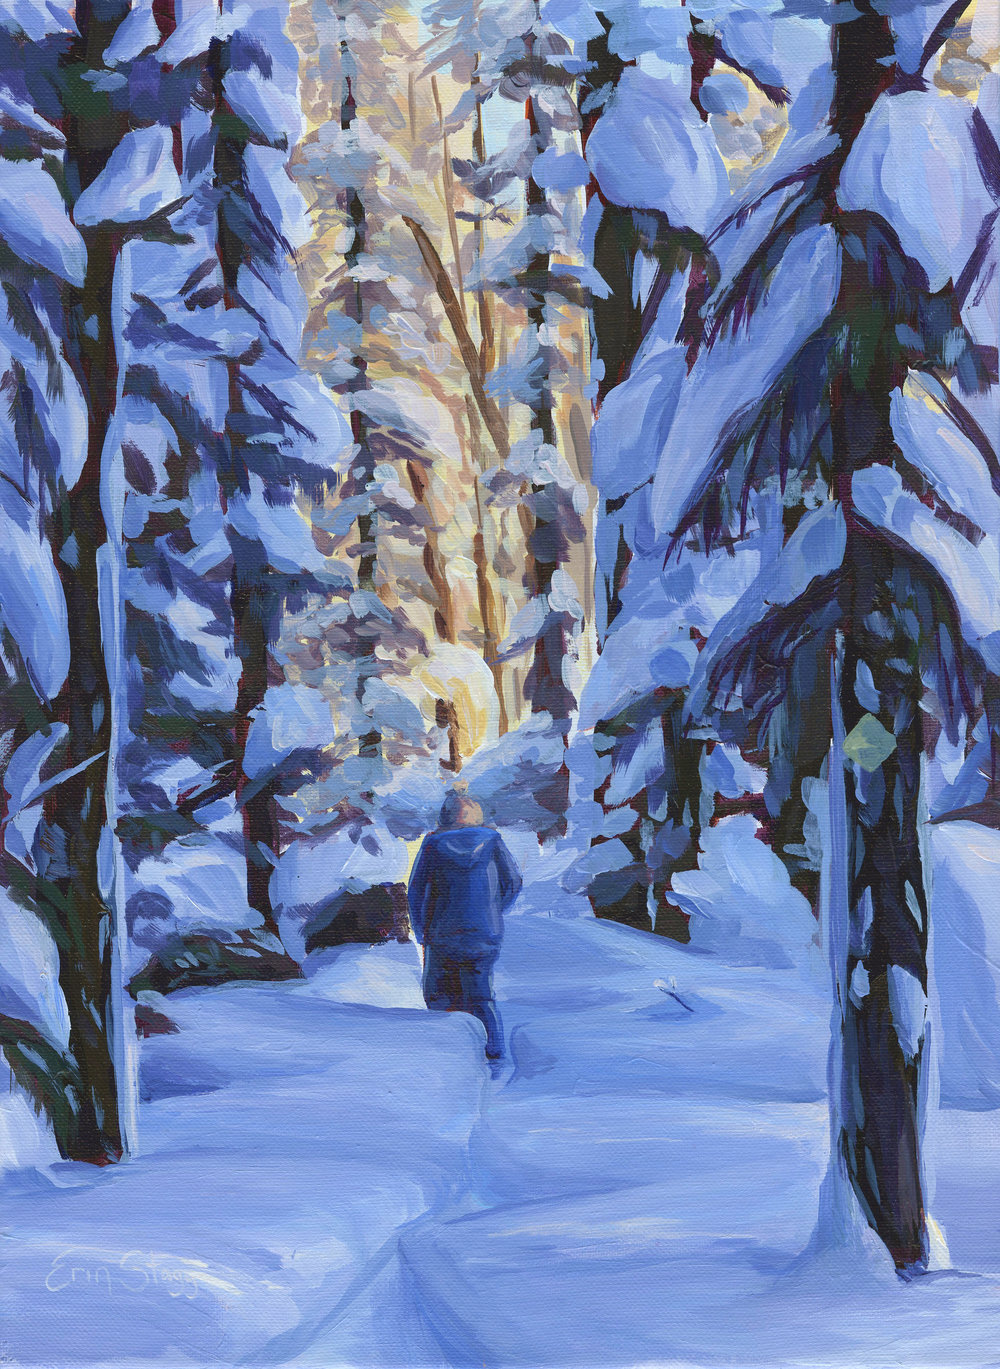 Snowshoeing through the pines - sm.jpg